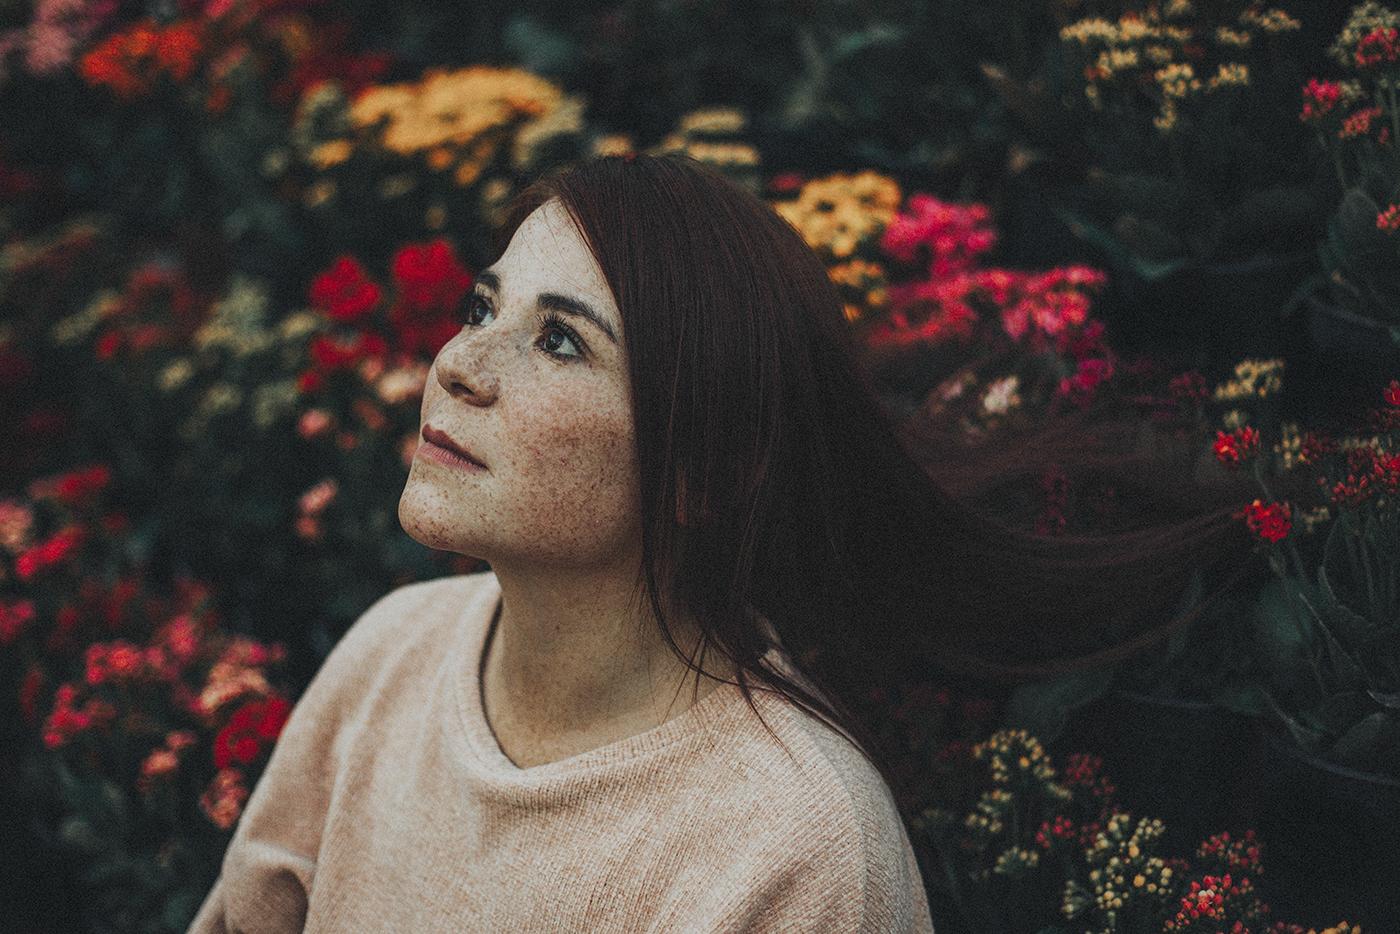 freckles redhair FINEART Natural Light modelo retrato portrait Flowers colors outdoors